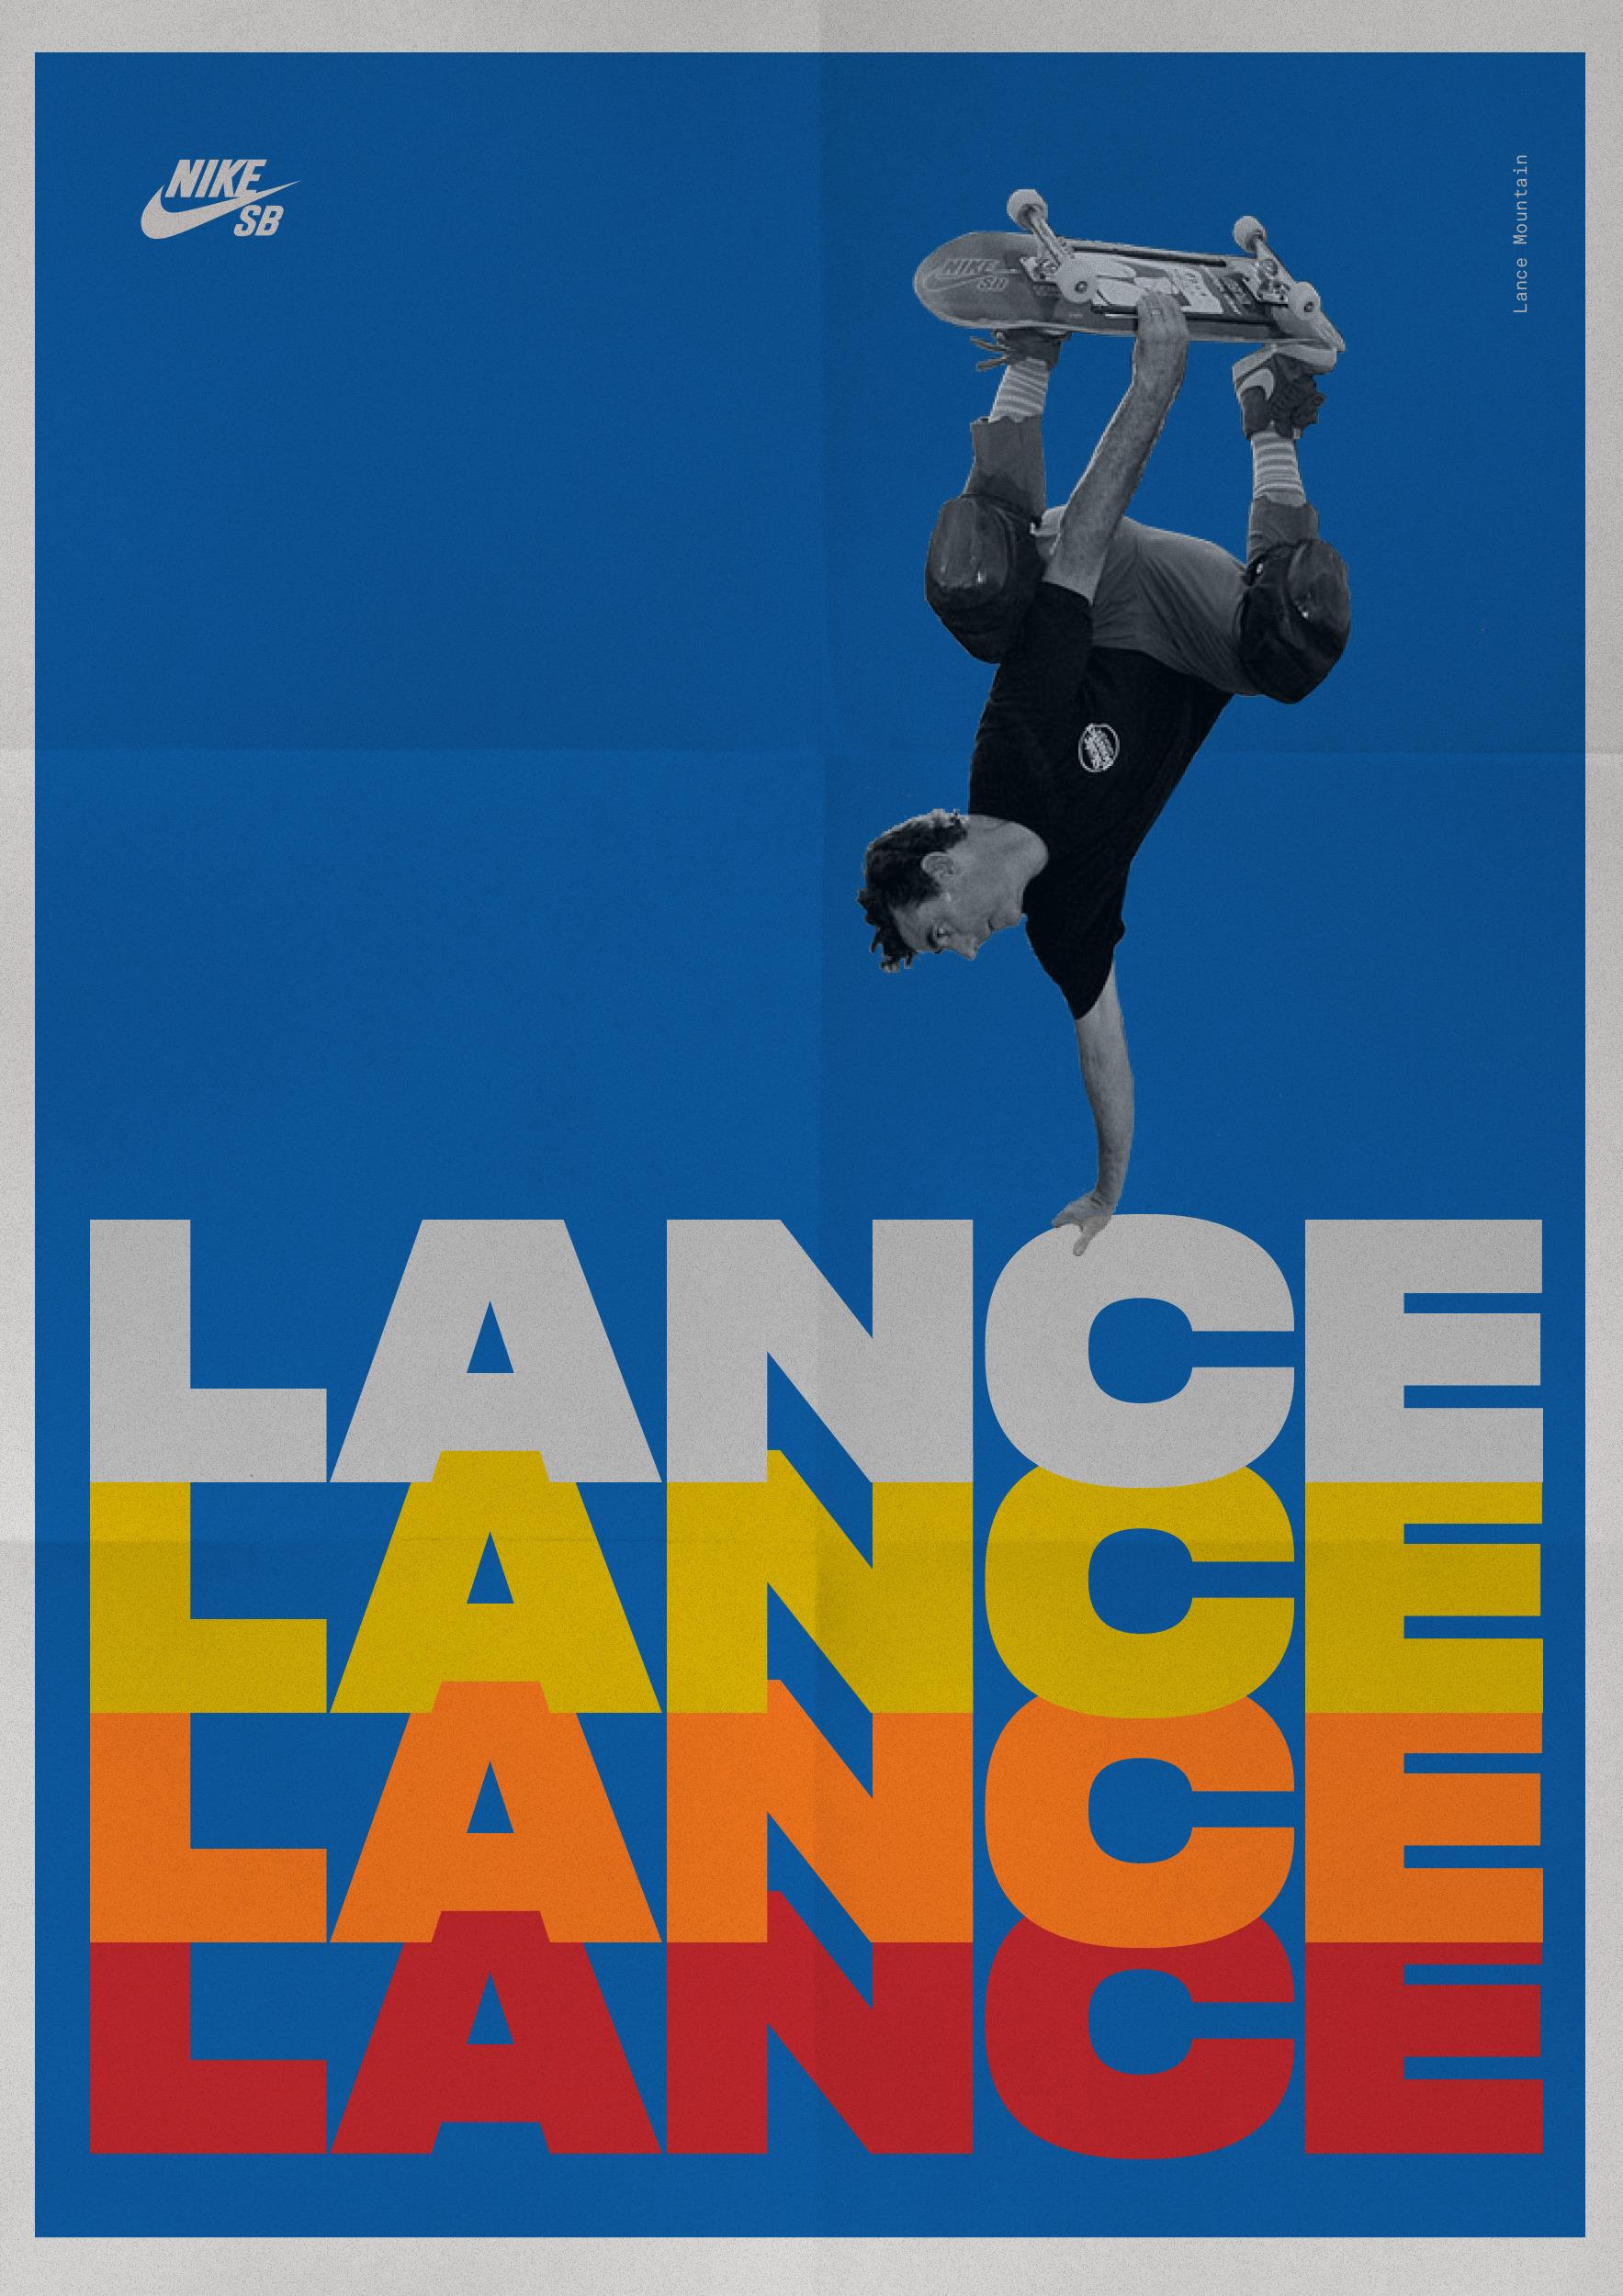 Lance Mountain. Nike SB - luiscoderque | ello